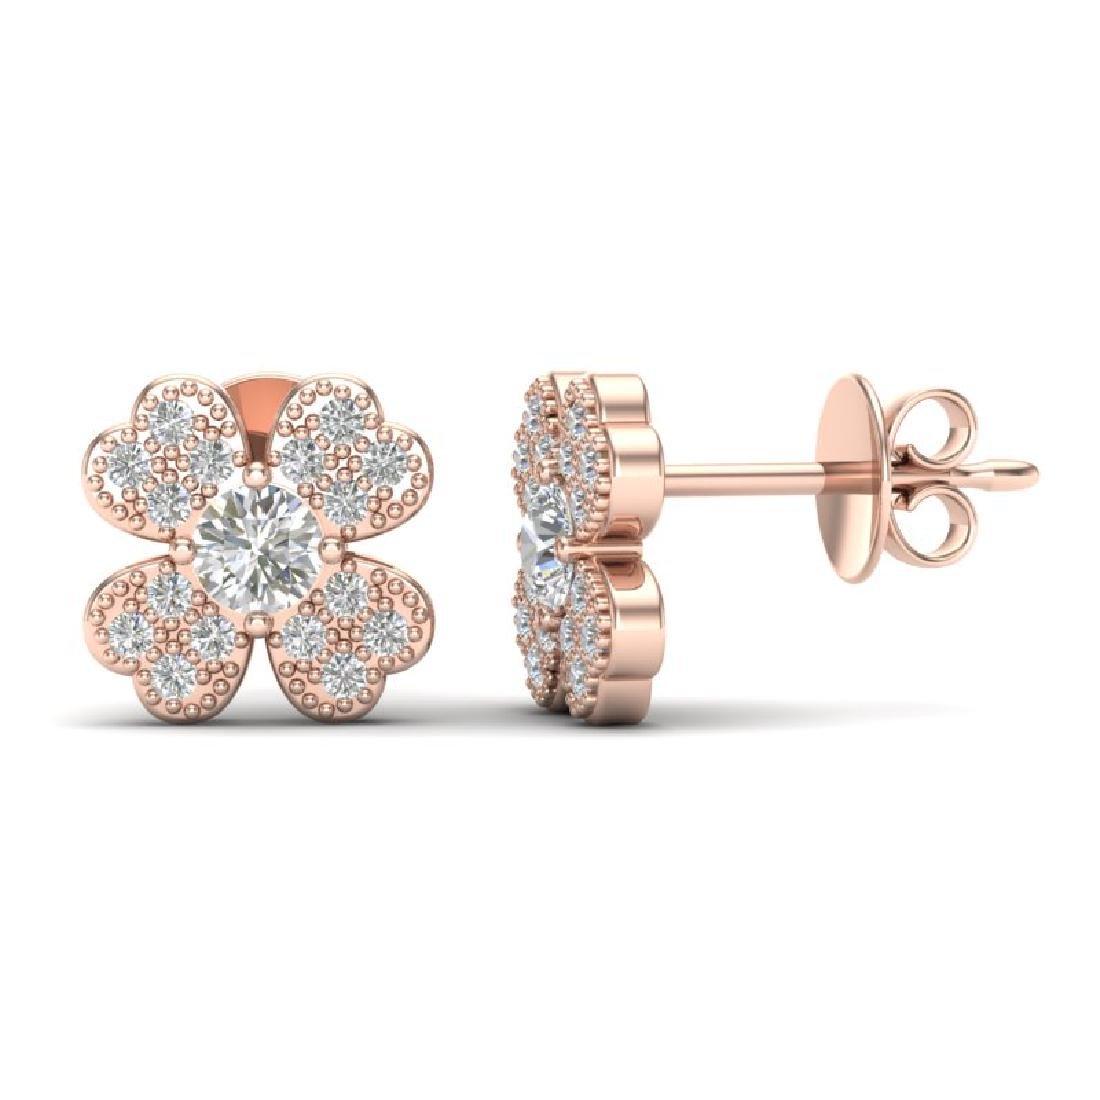 0.54 CTW Micro Pave VS/SI Diamond Earrings 14K Rose - 2